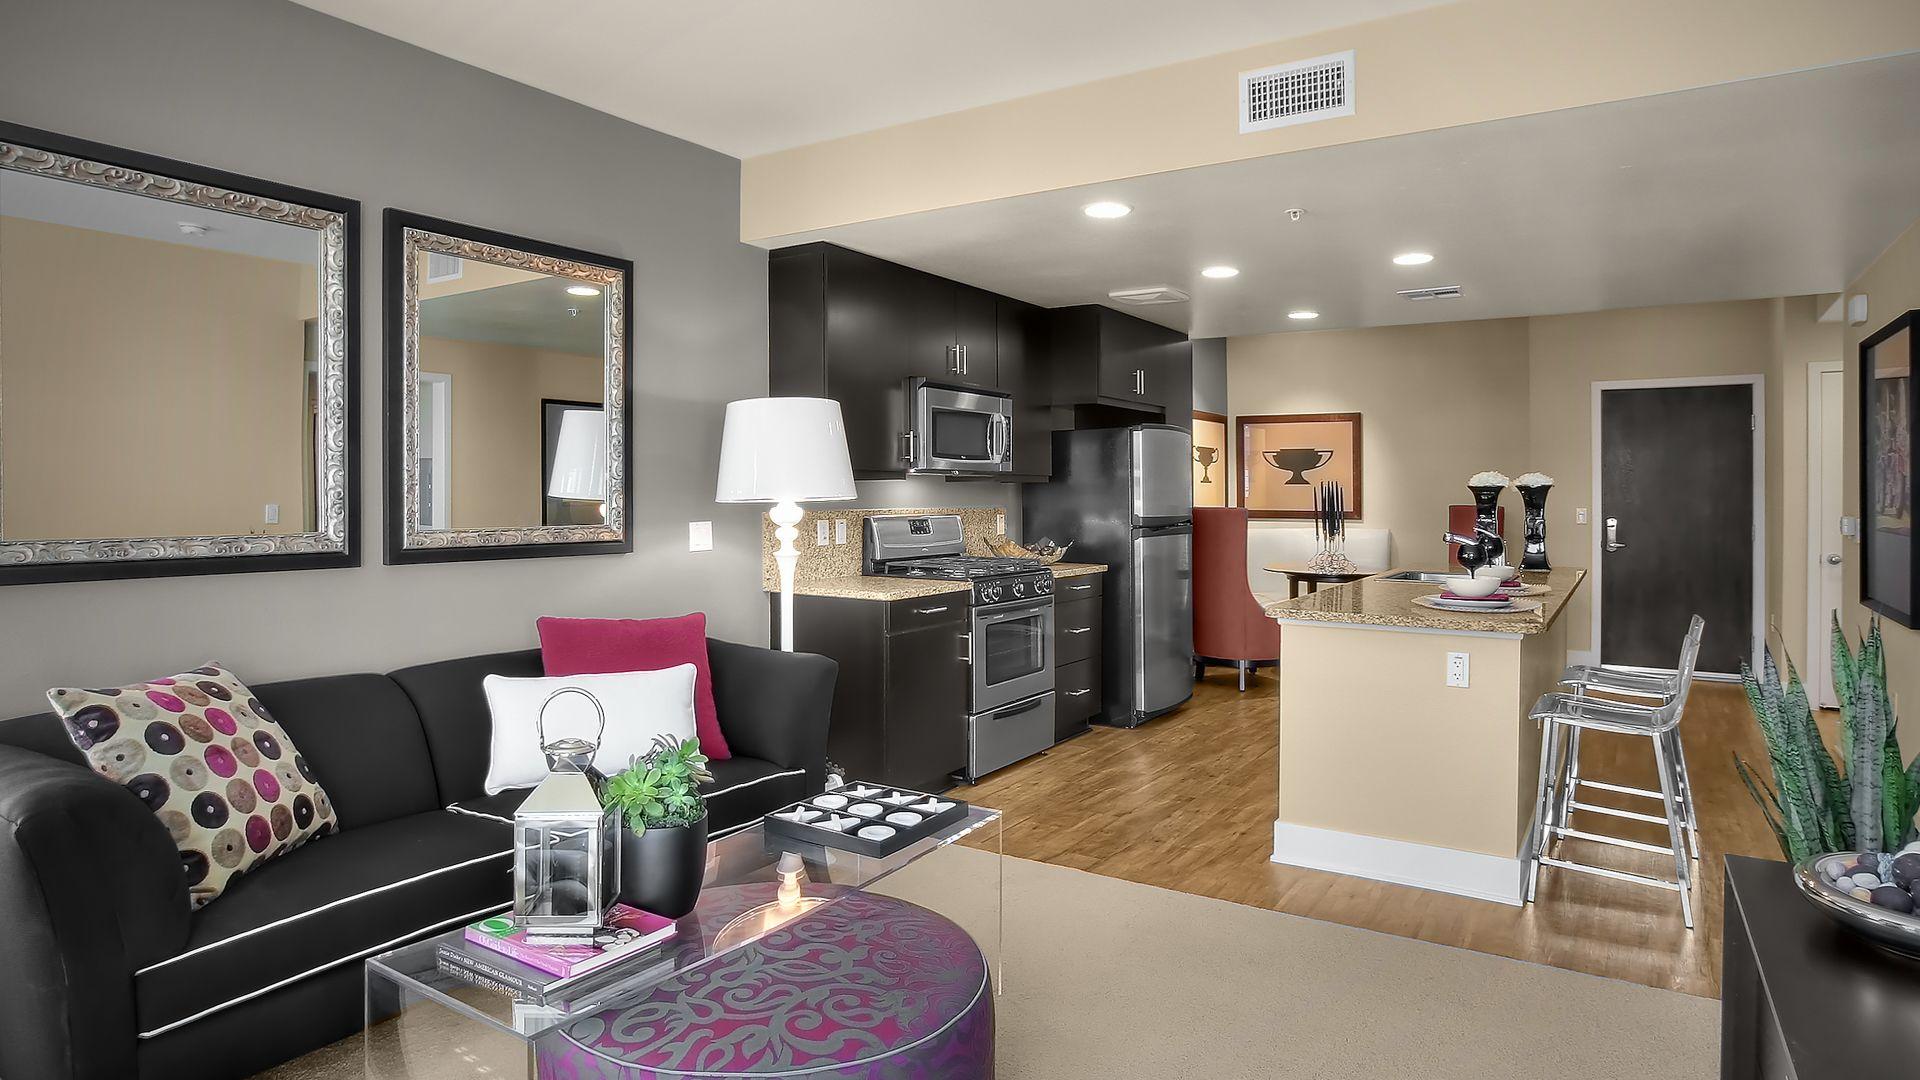 Westgate Apartments   Kitchen. Westgate Apartments   Old Town Pasadena   231 South De Lacey